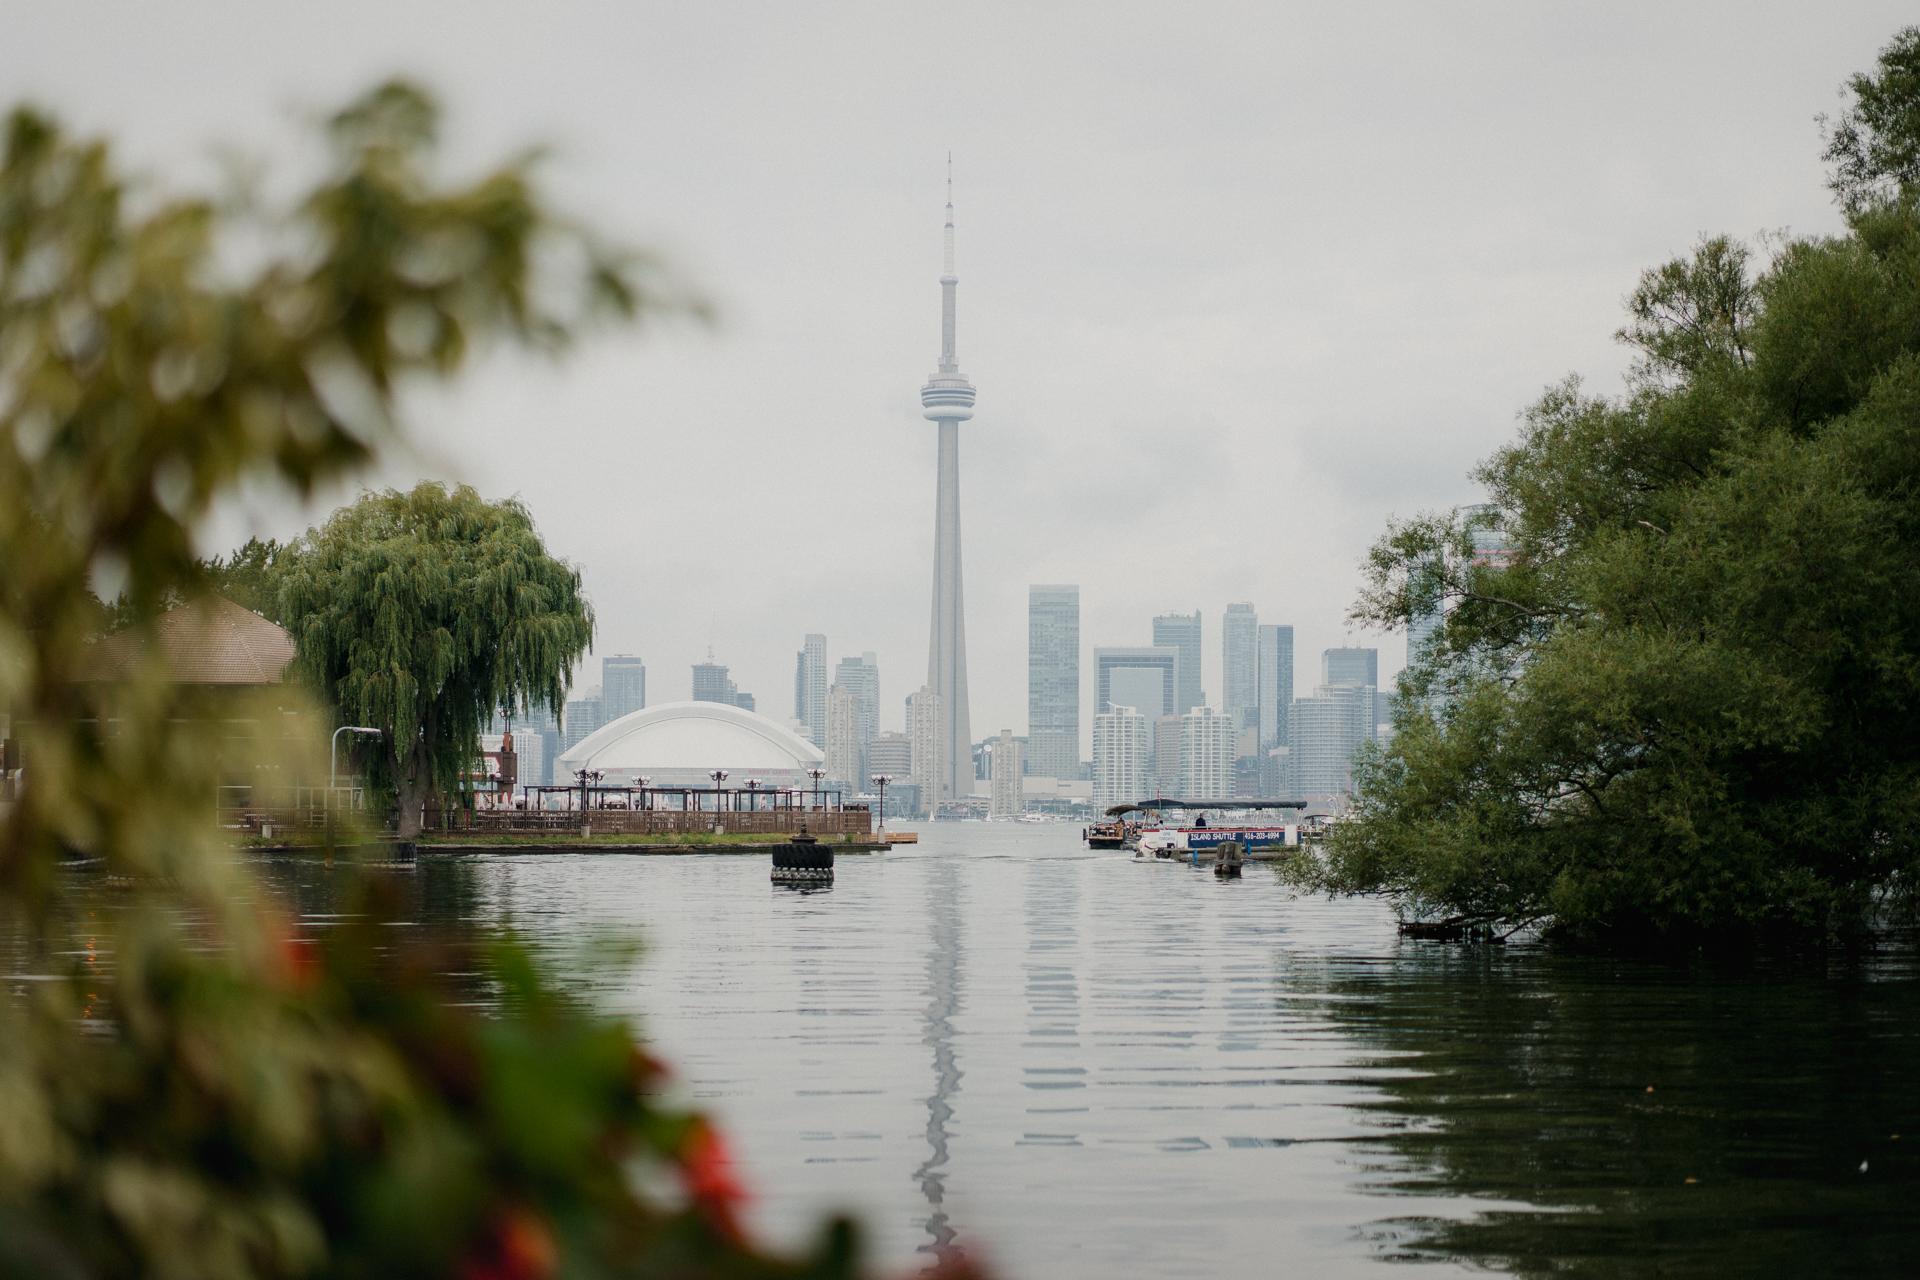 Toronto-Photo-Story-12.jpg